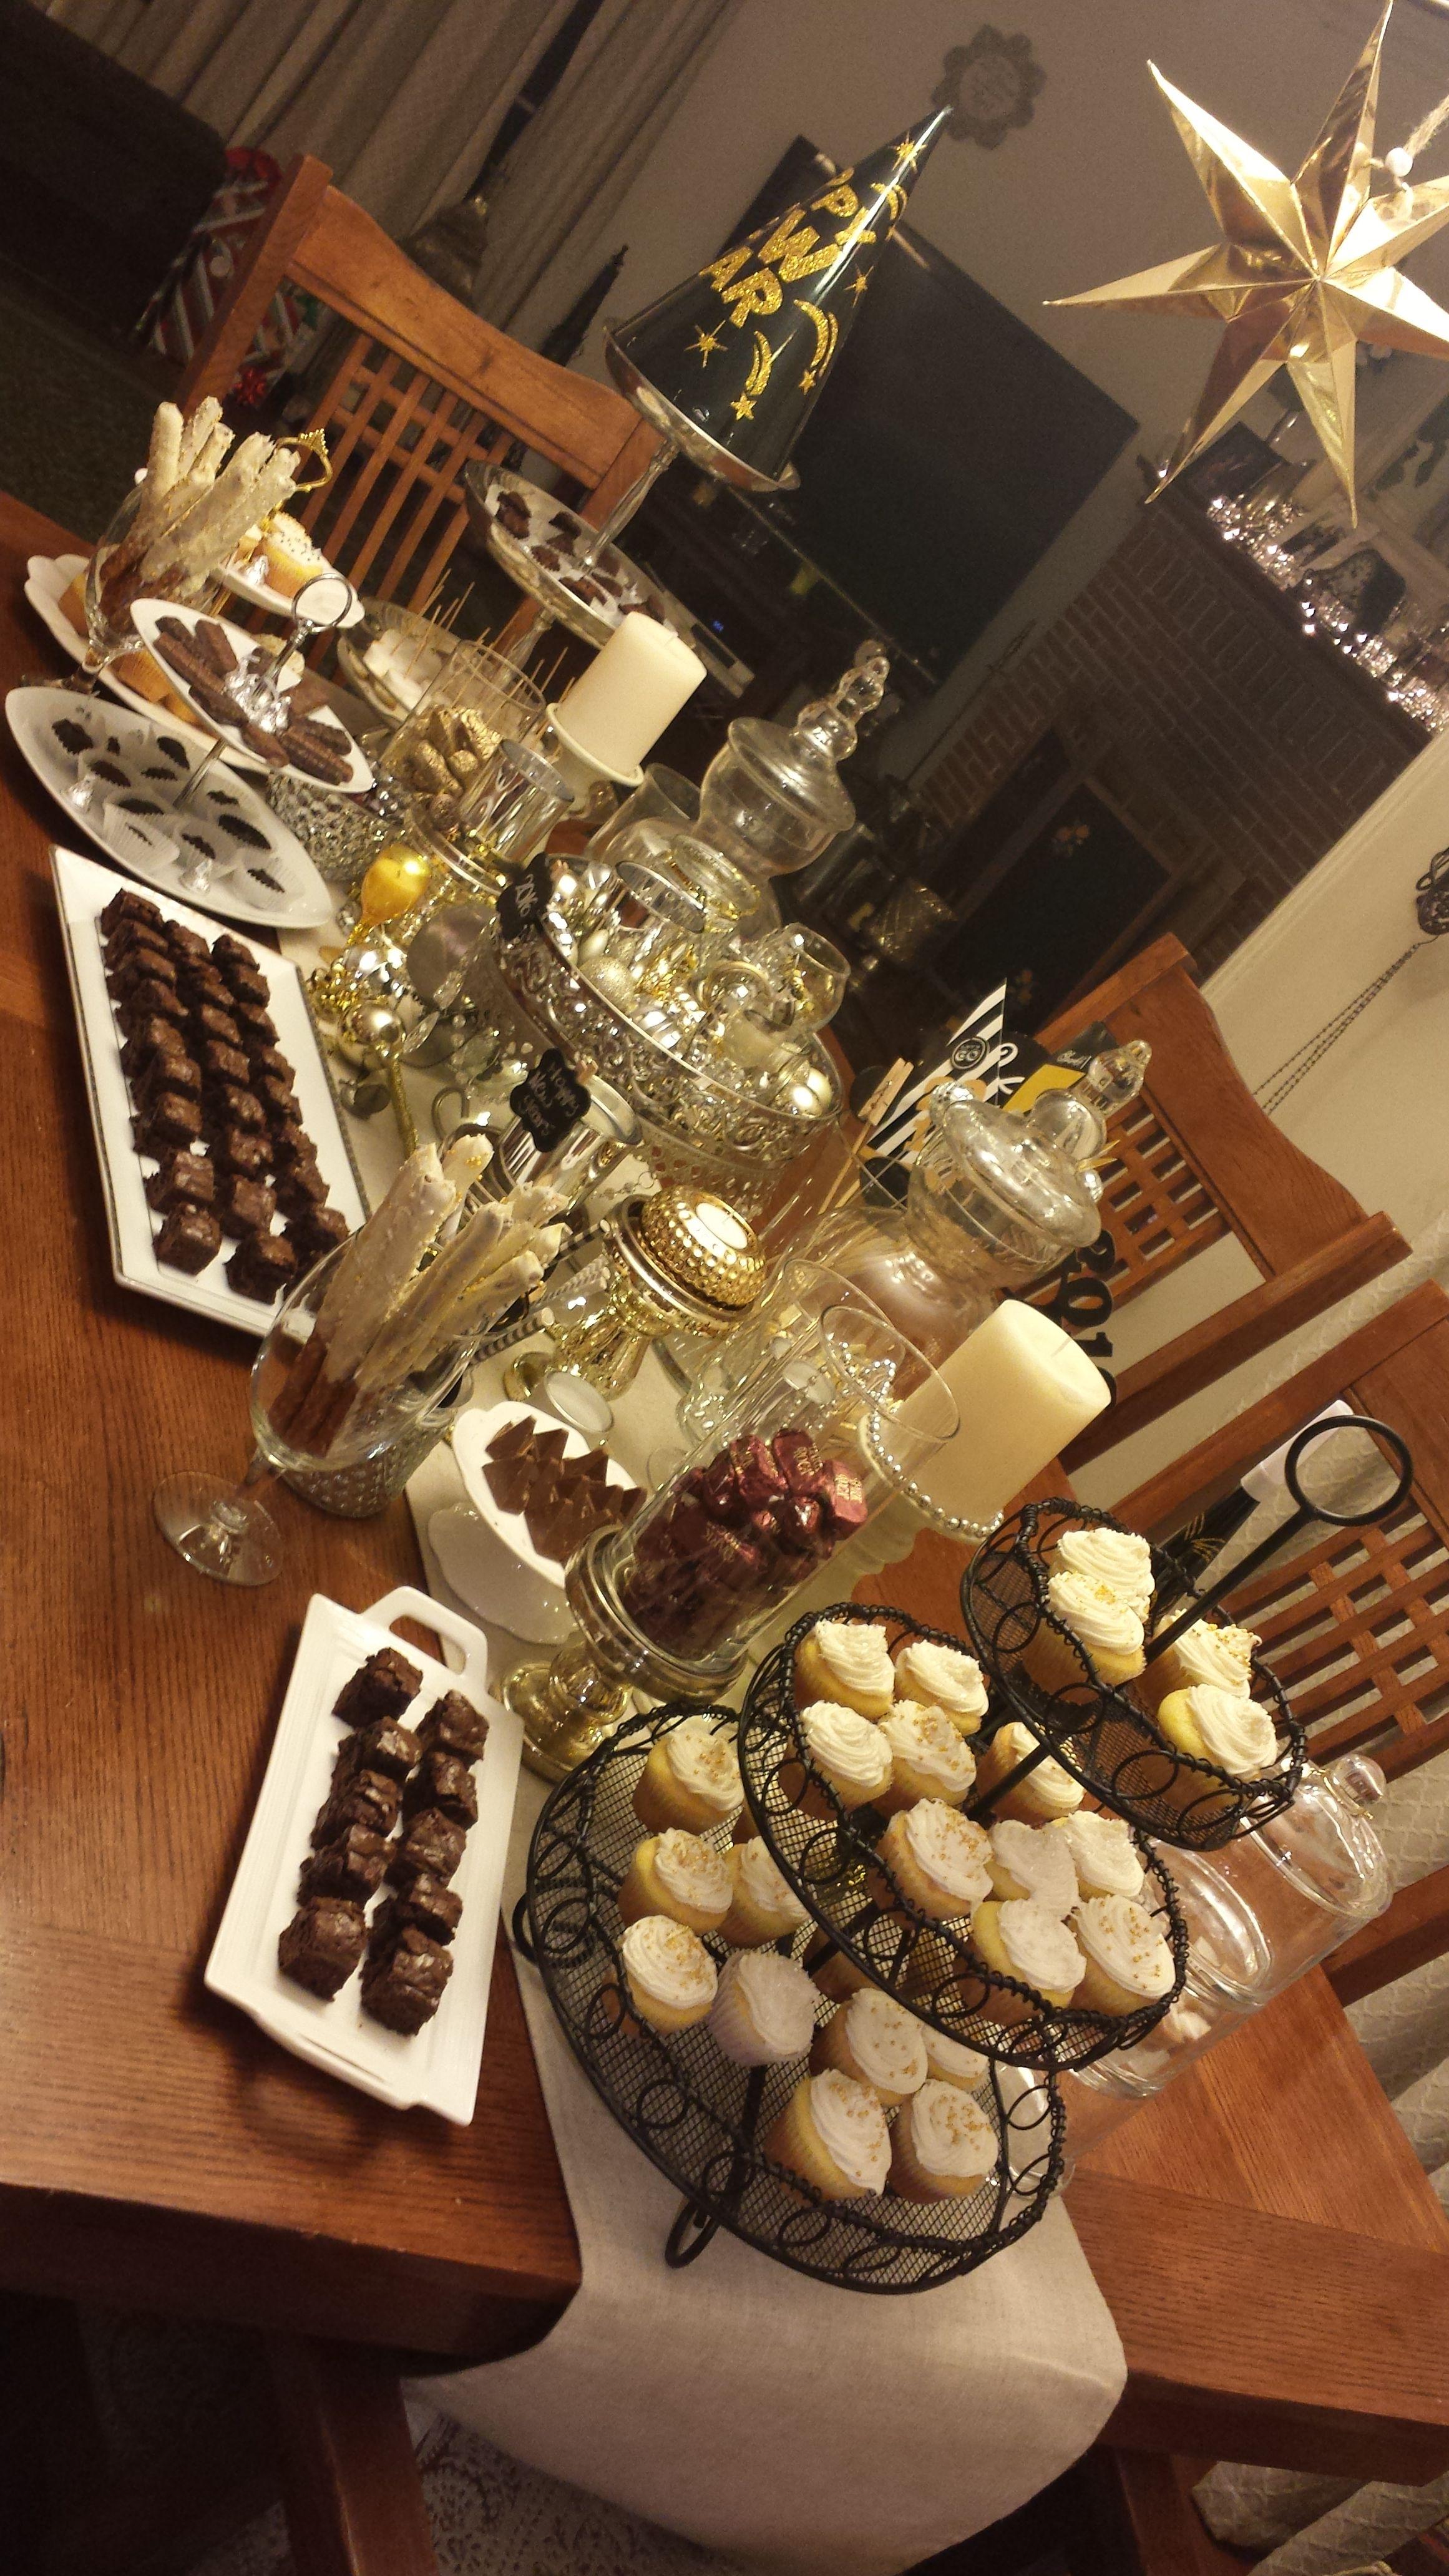 New Years Eve Dessert Table | New years eve dessert, New ...